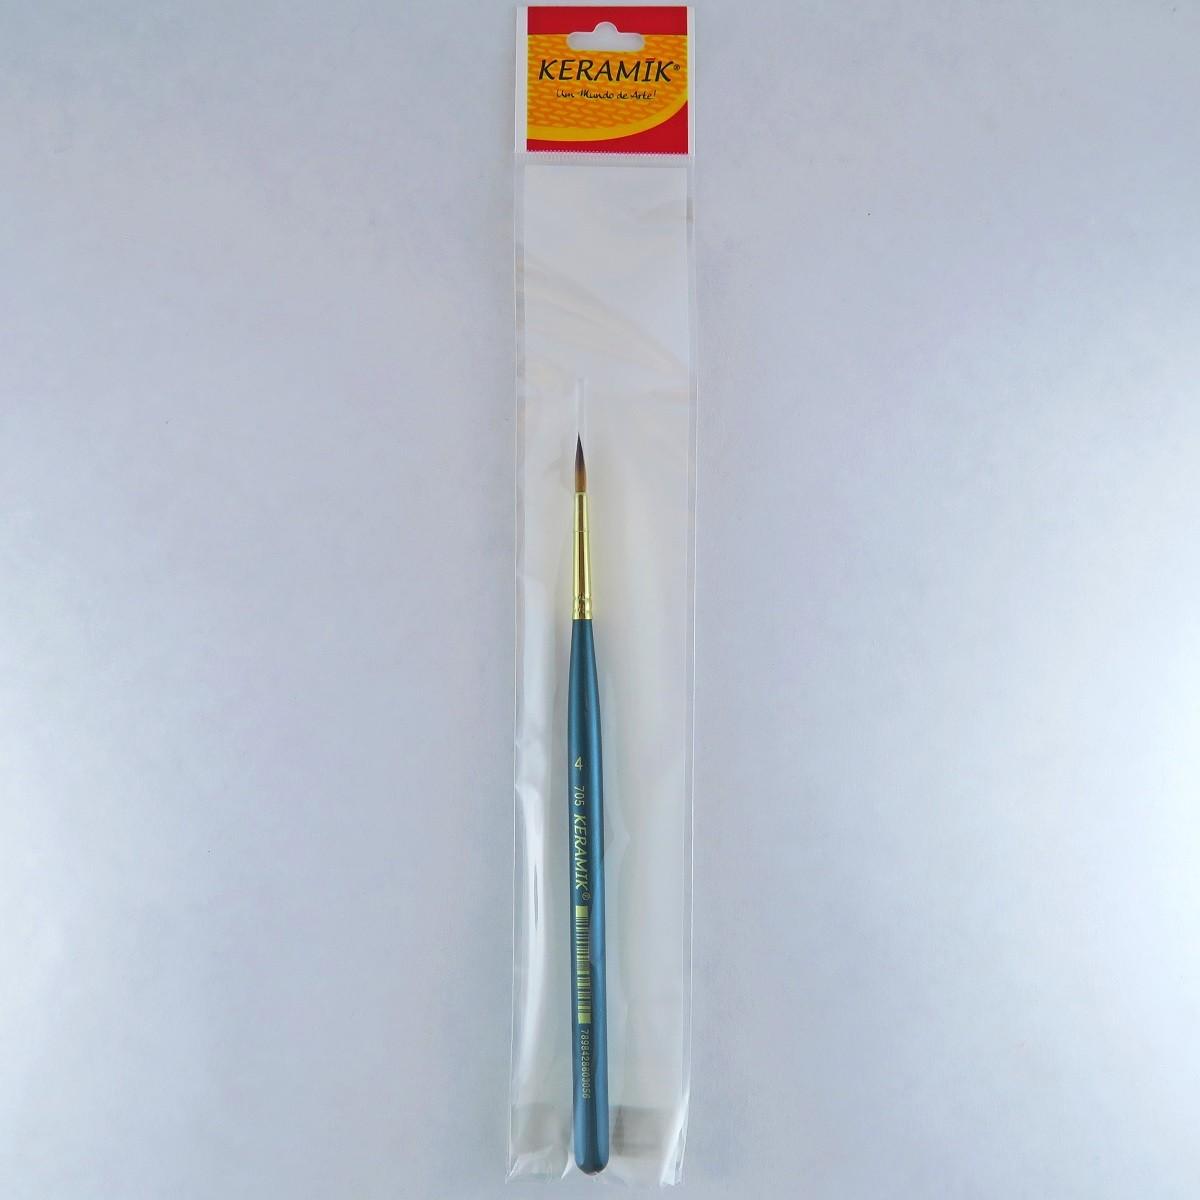 Pincel Keramik Premium 705 Redondo